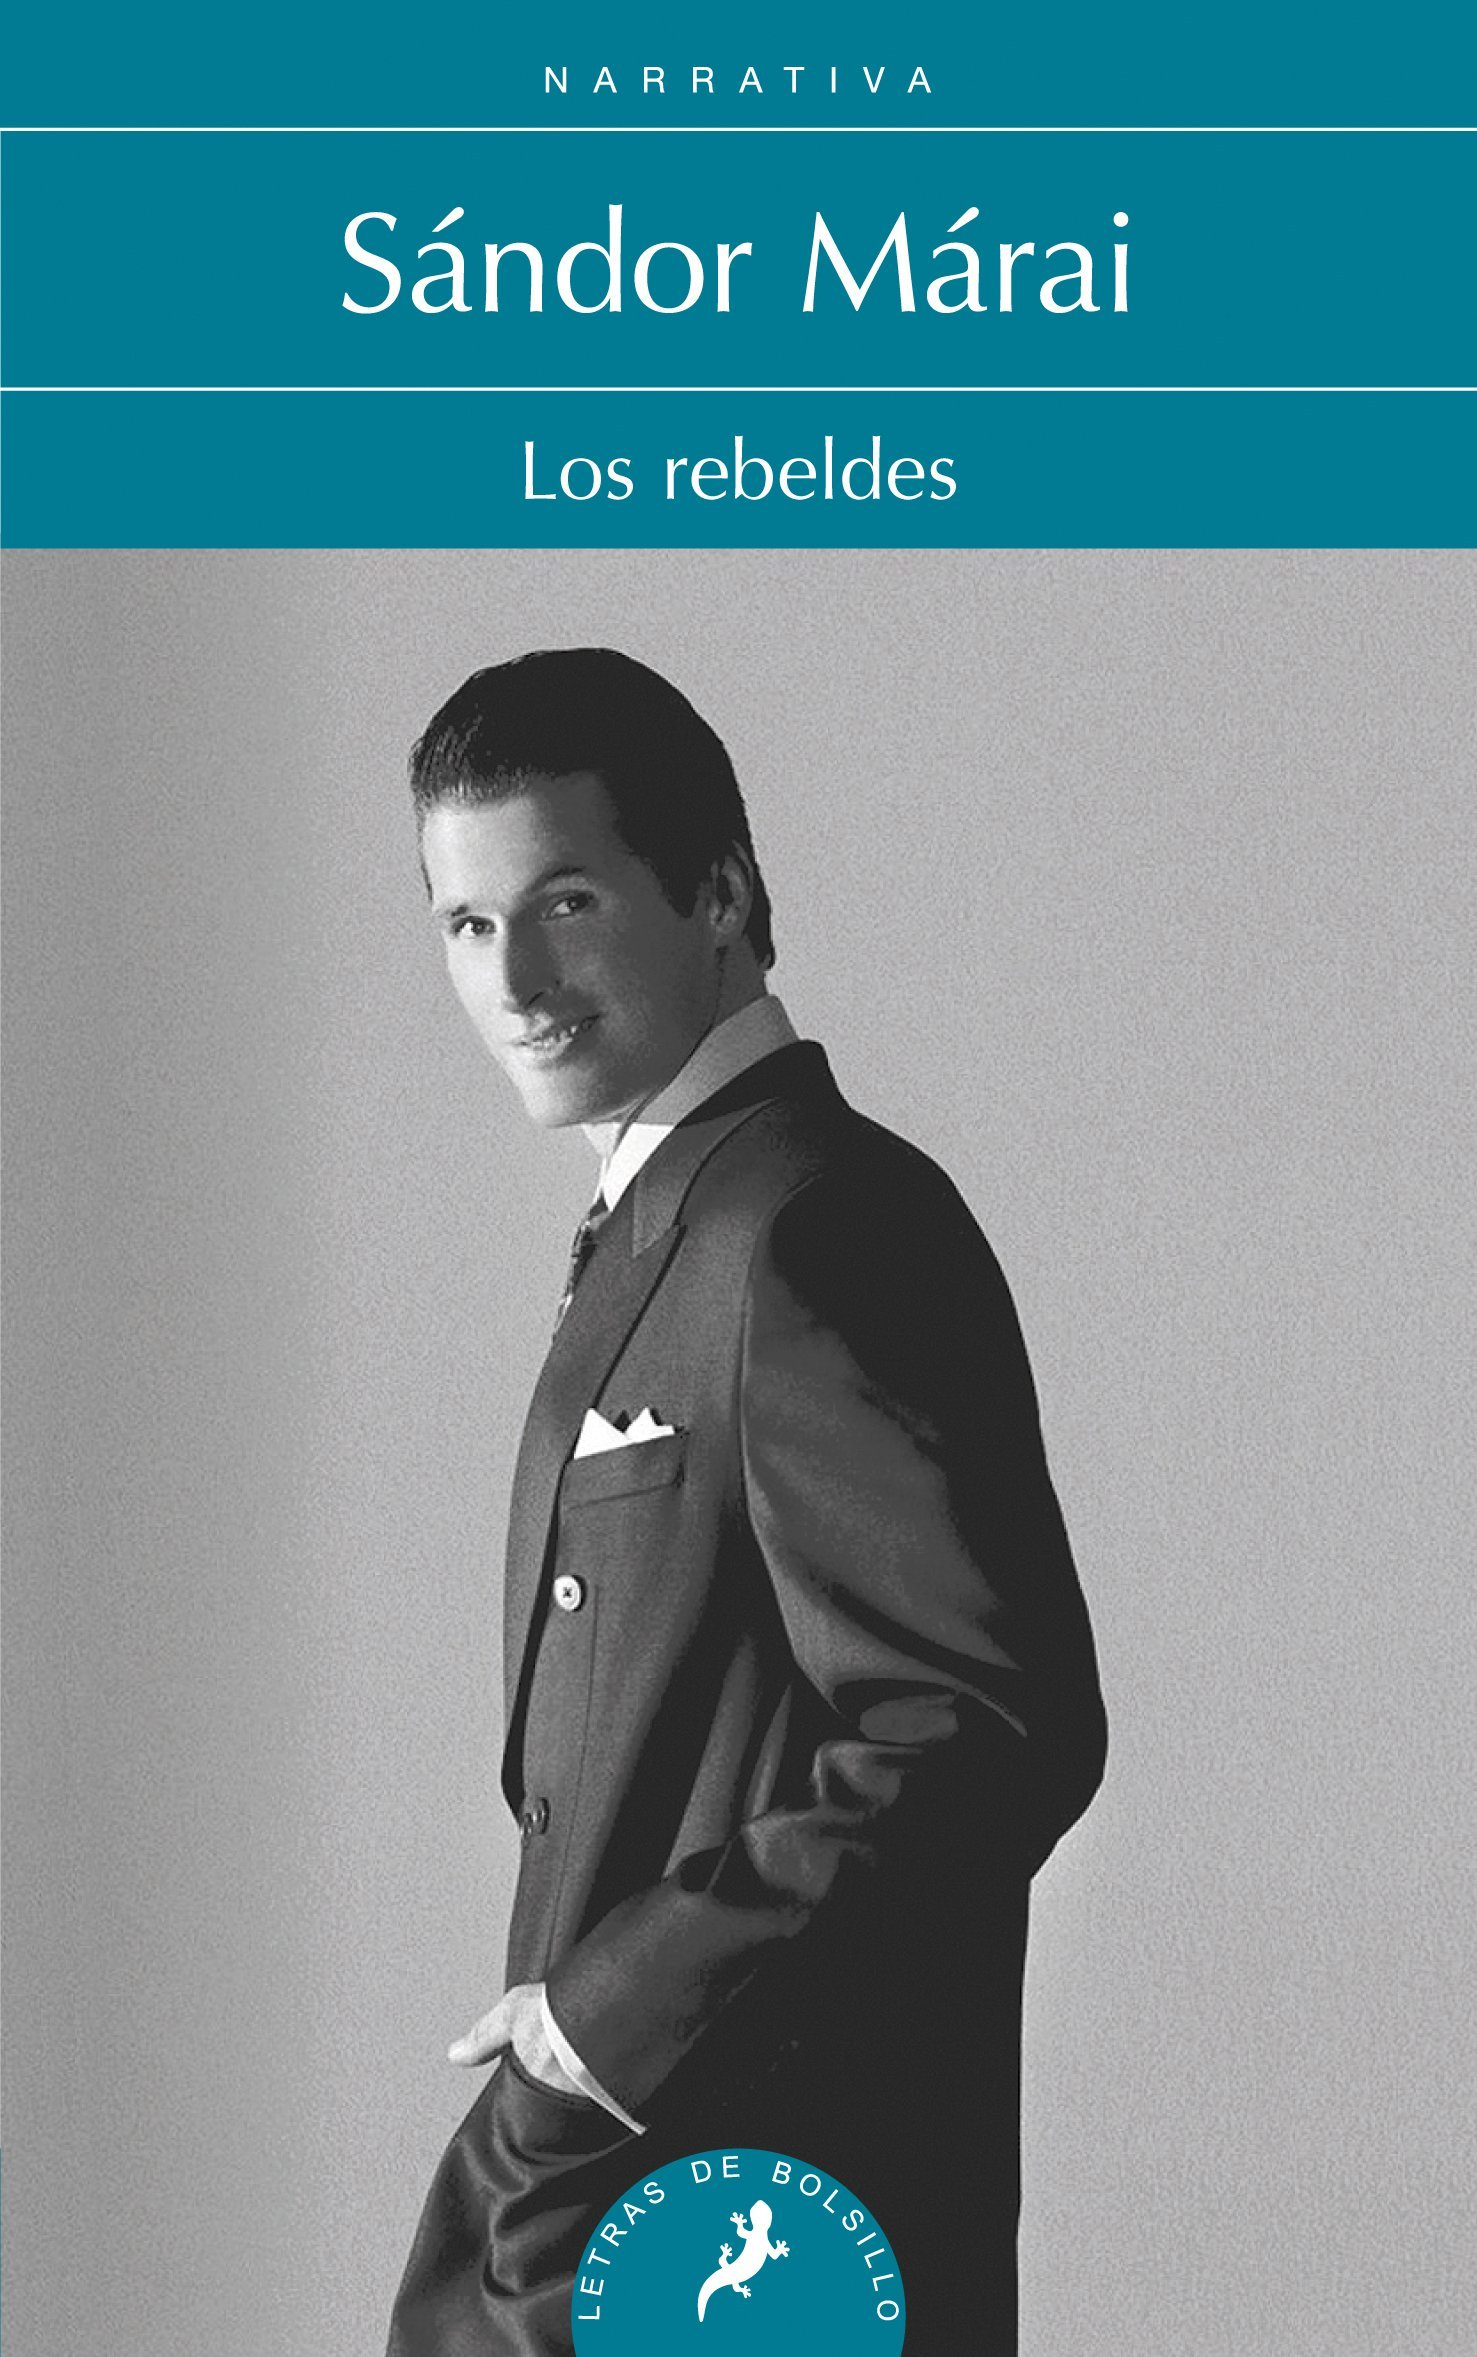 Rebeldes, Los (Spanish Edition): Sandor Marai: 9788498384352: Amazon.com: Books